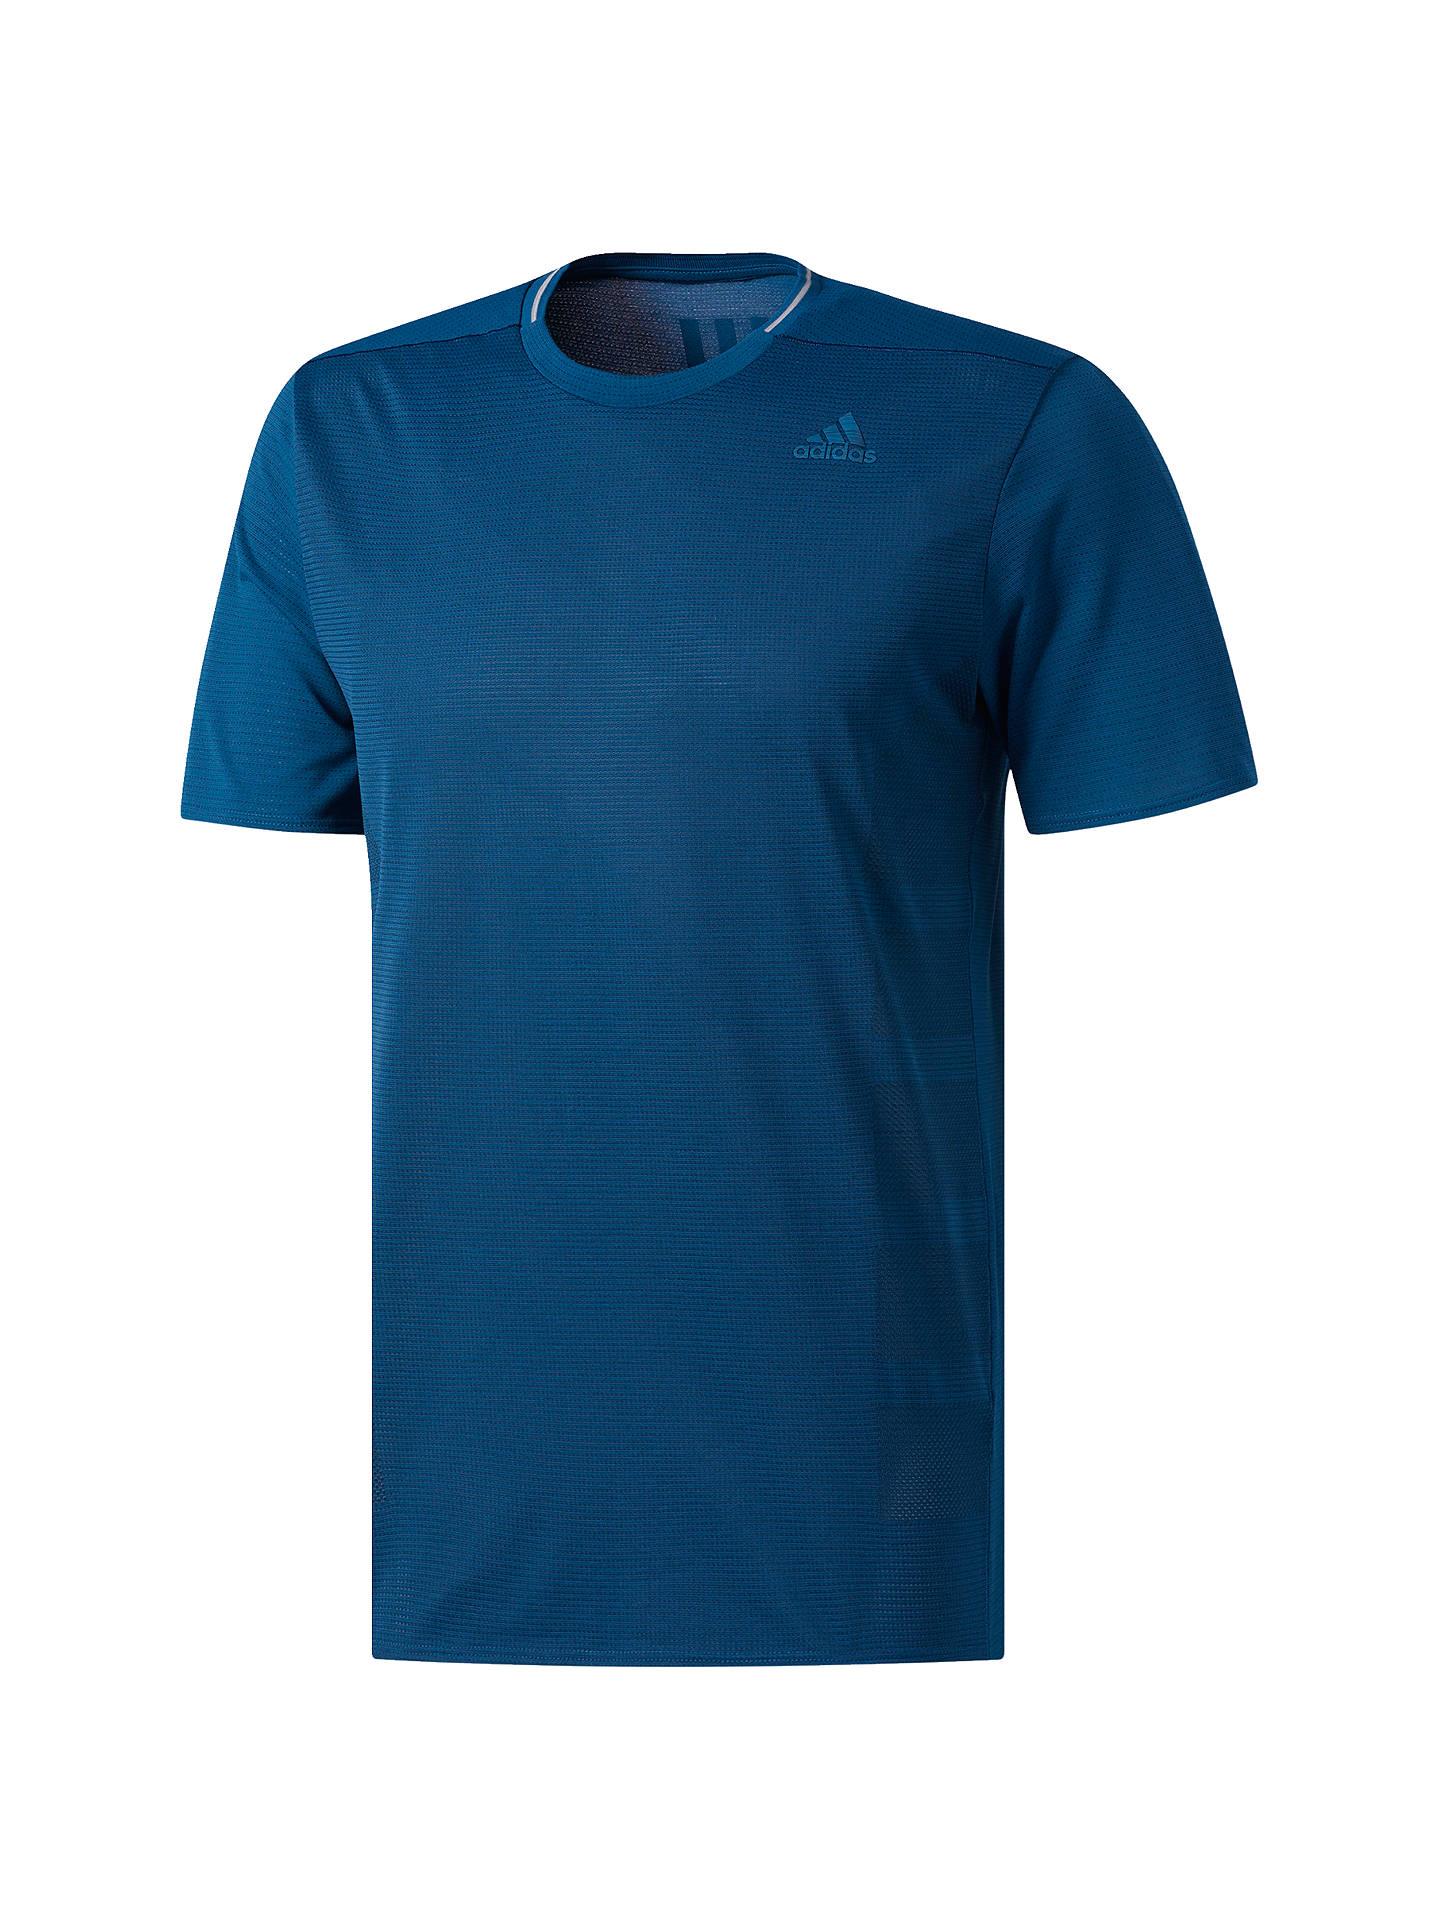 003154c6 ... Buy adidas Supernova Short Sleeve Running T-Shirt, Navy, S Online at  johnlewis ...